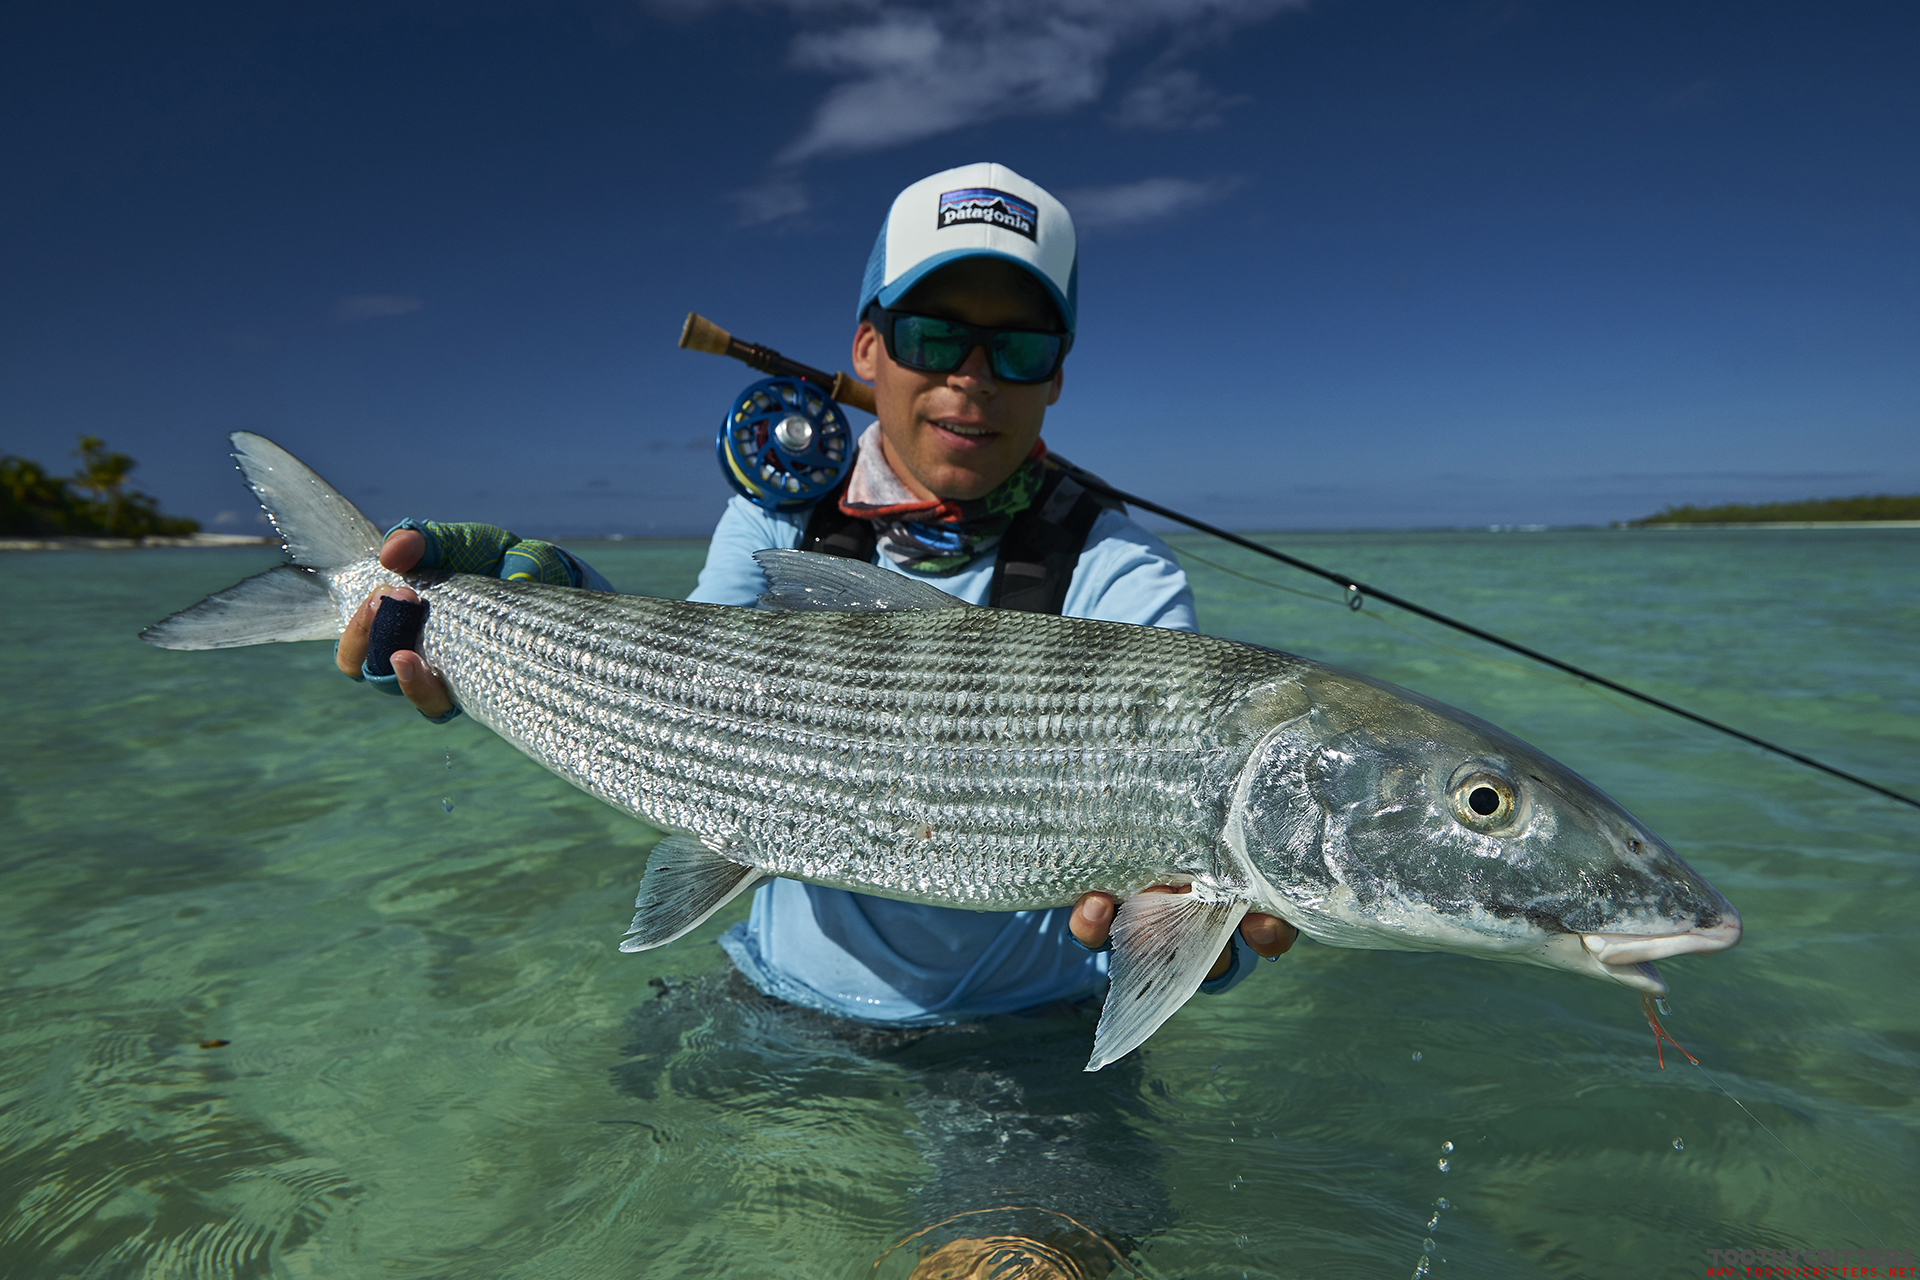 Fly fishing on aitutaki for bonefish and giant trevally for Bonefish fly fishing